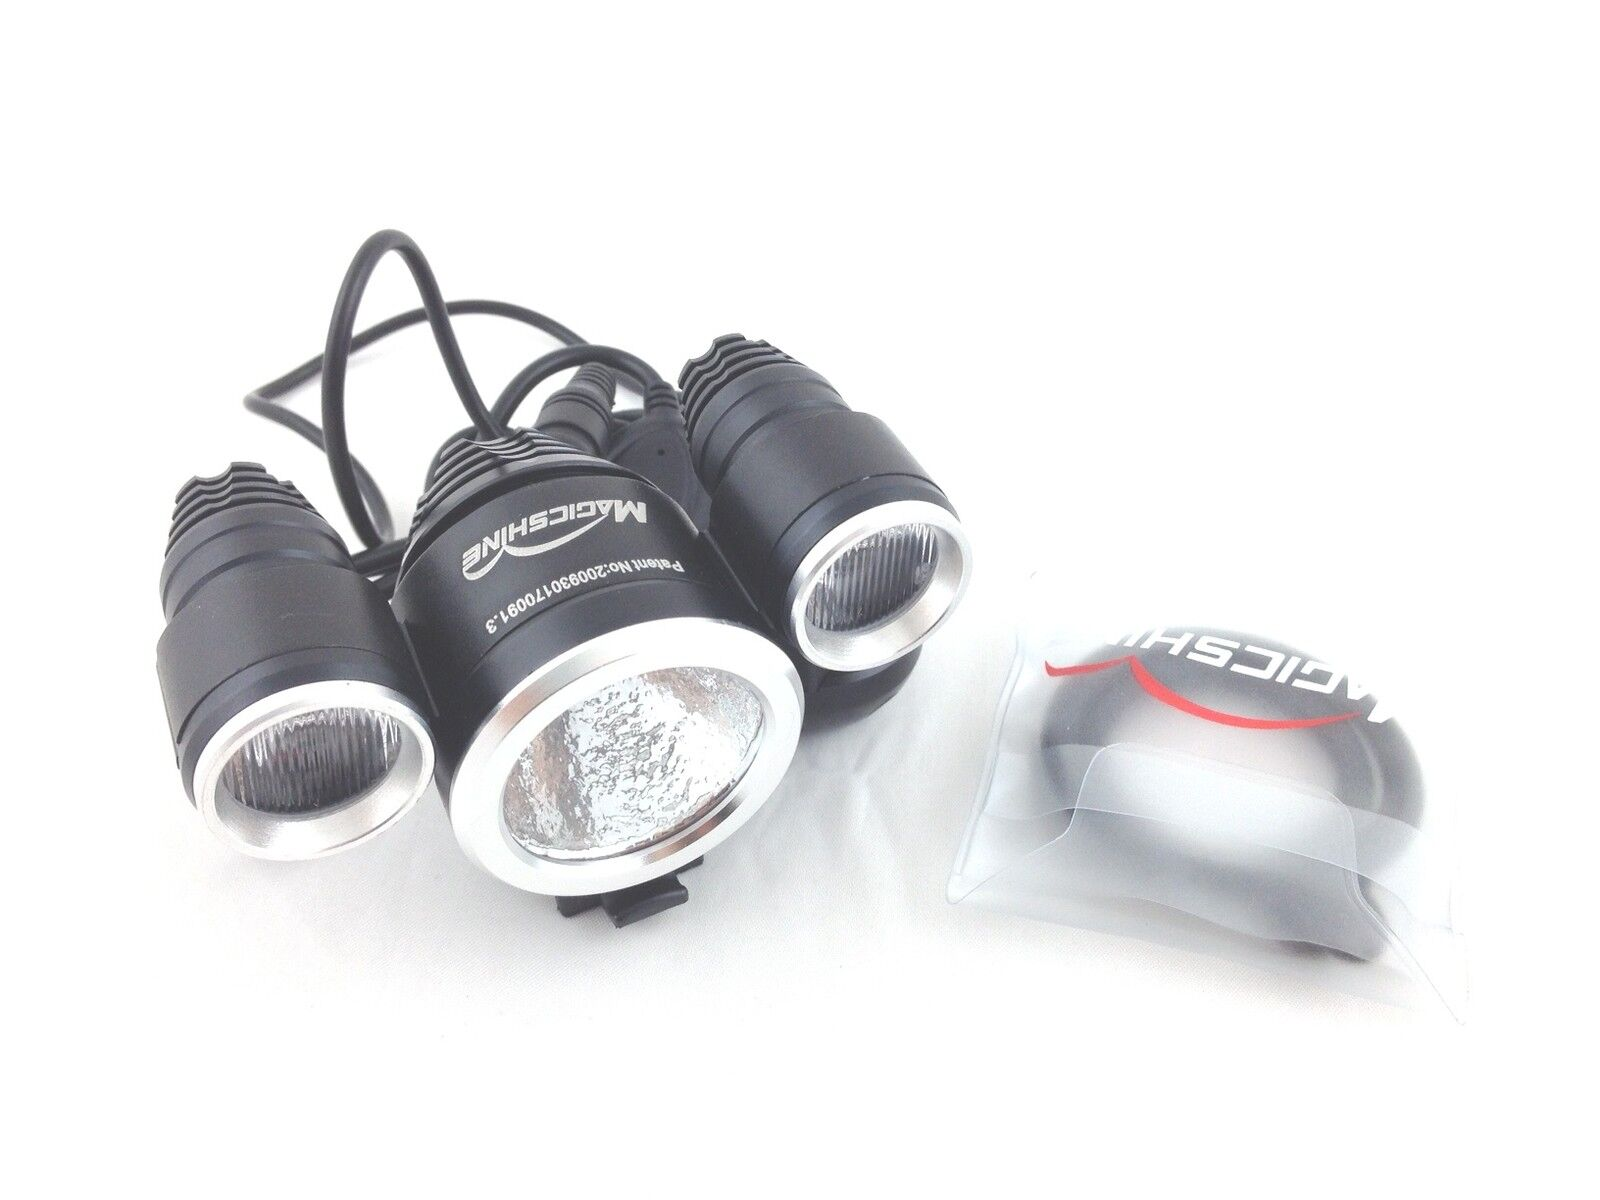 MagicShine MJ-816E 1800 Lumen Wide Angle LED Bike Light Head ONLY with O-rings